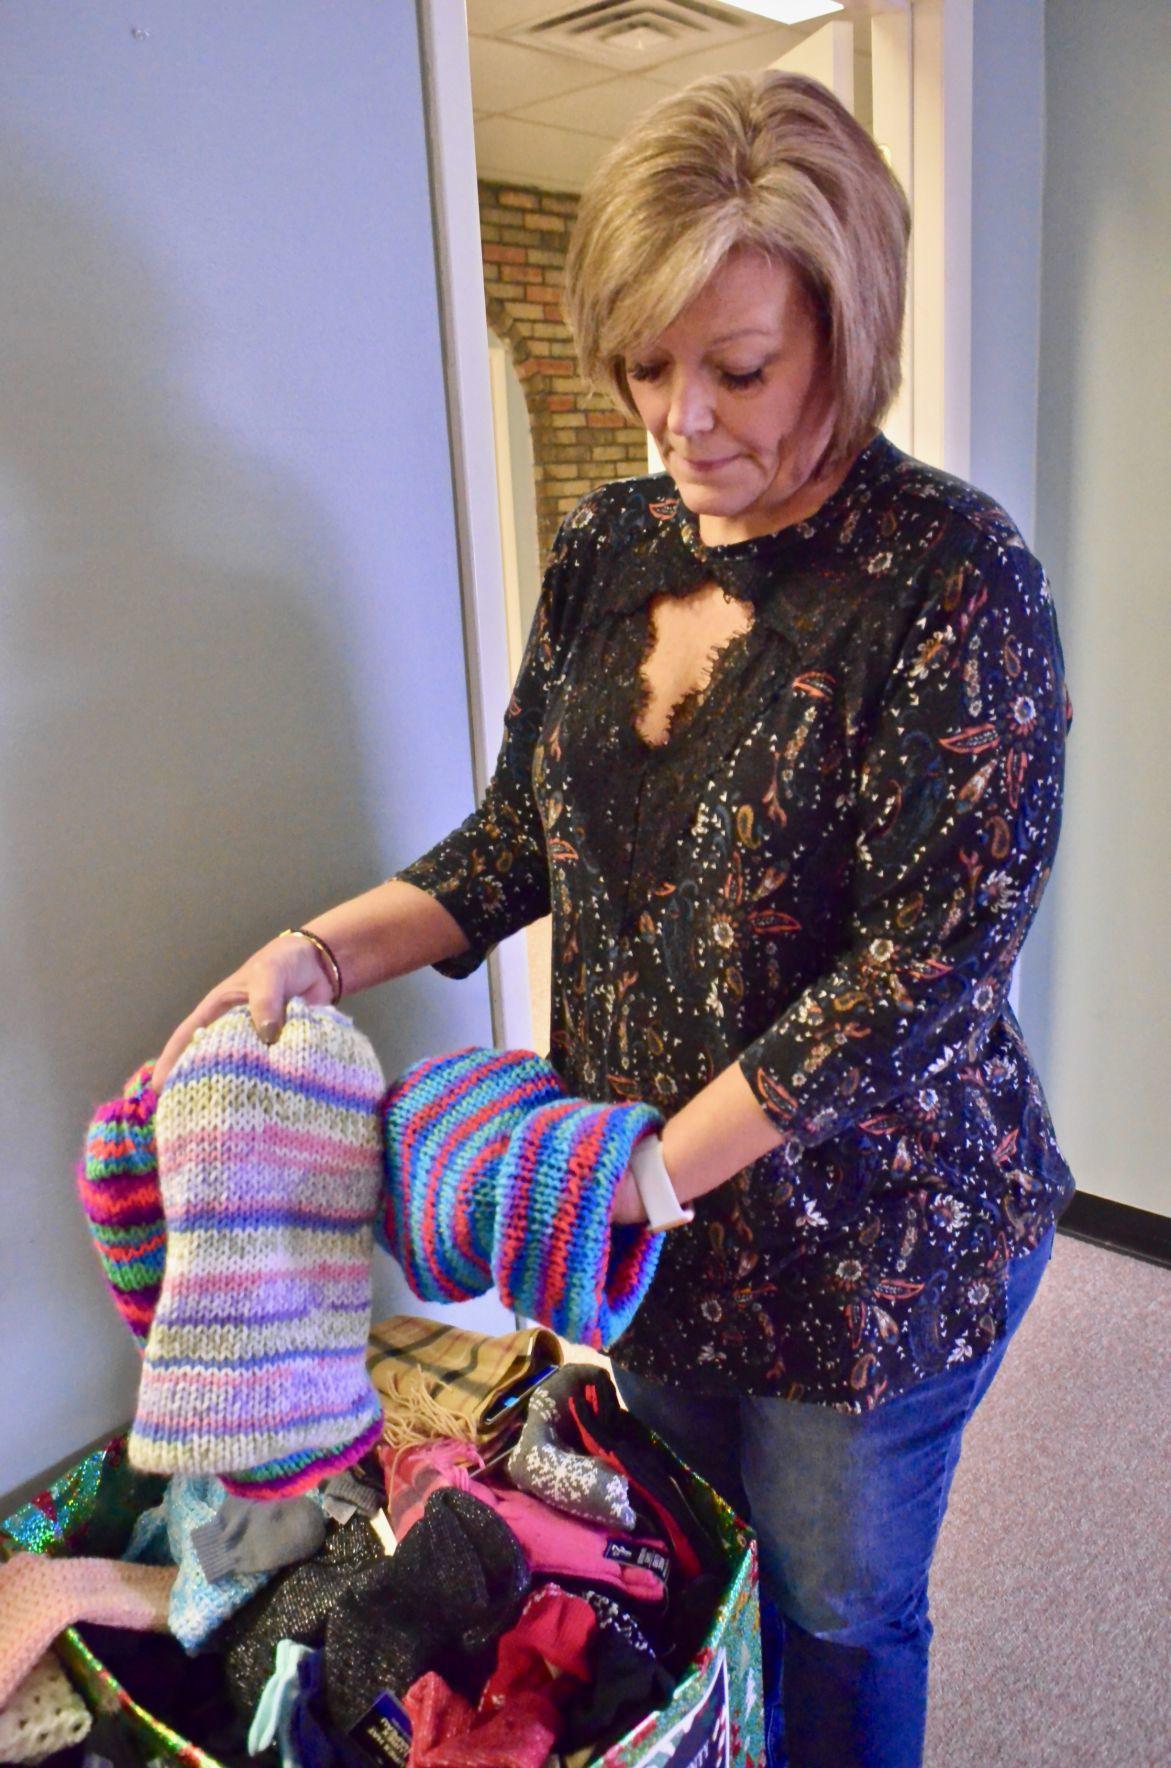 2019-11-27 wcat-help in crisis drive